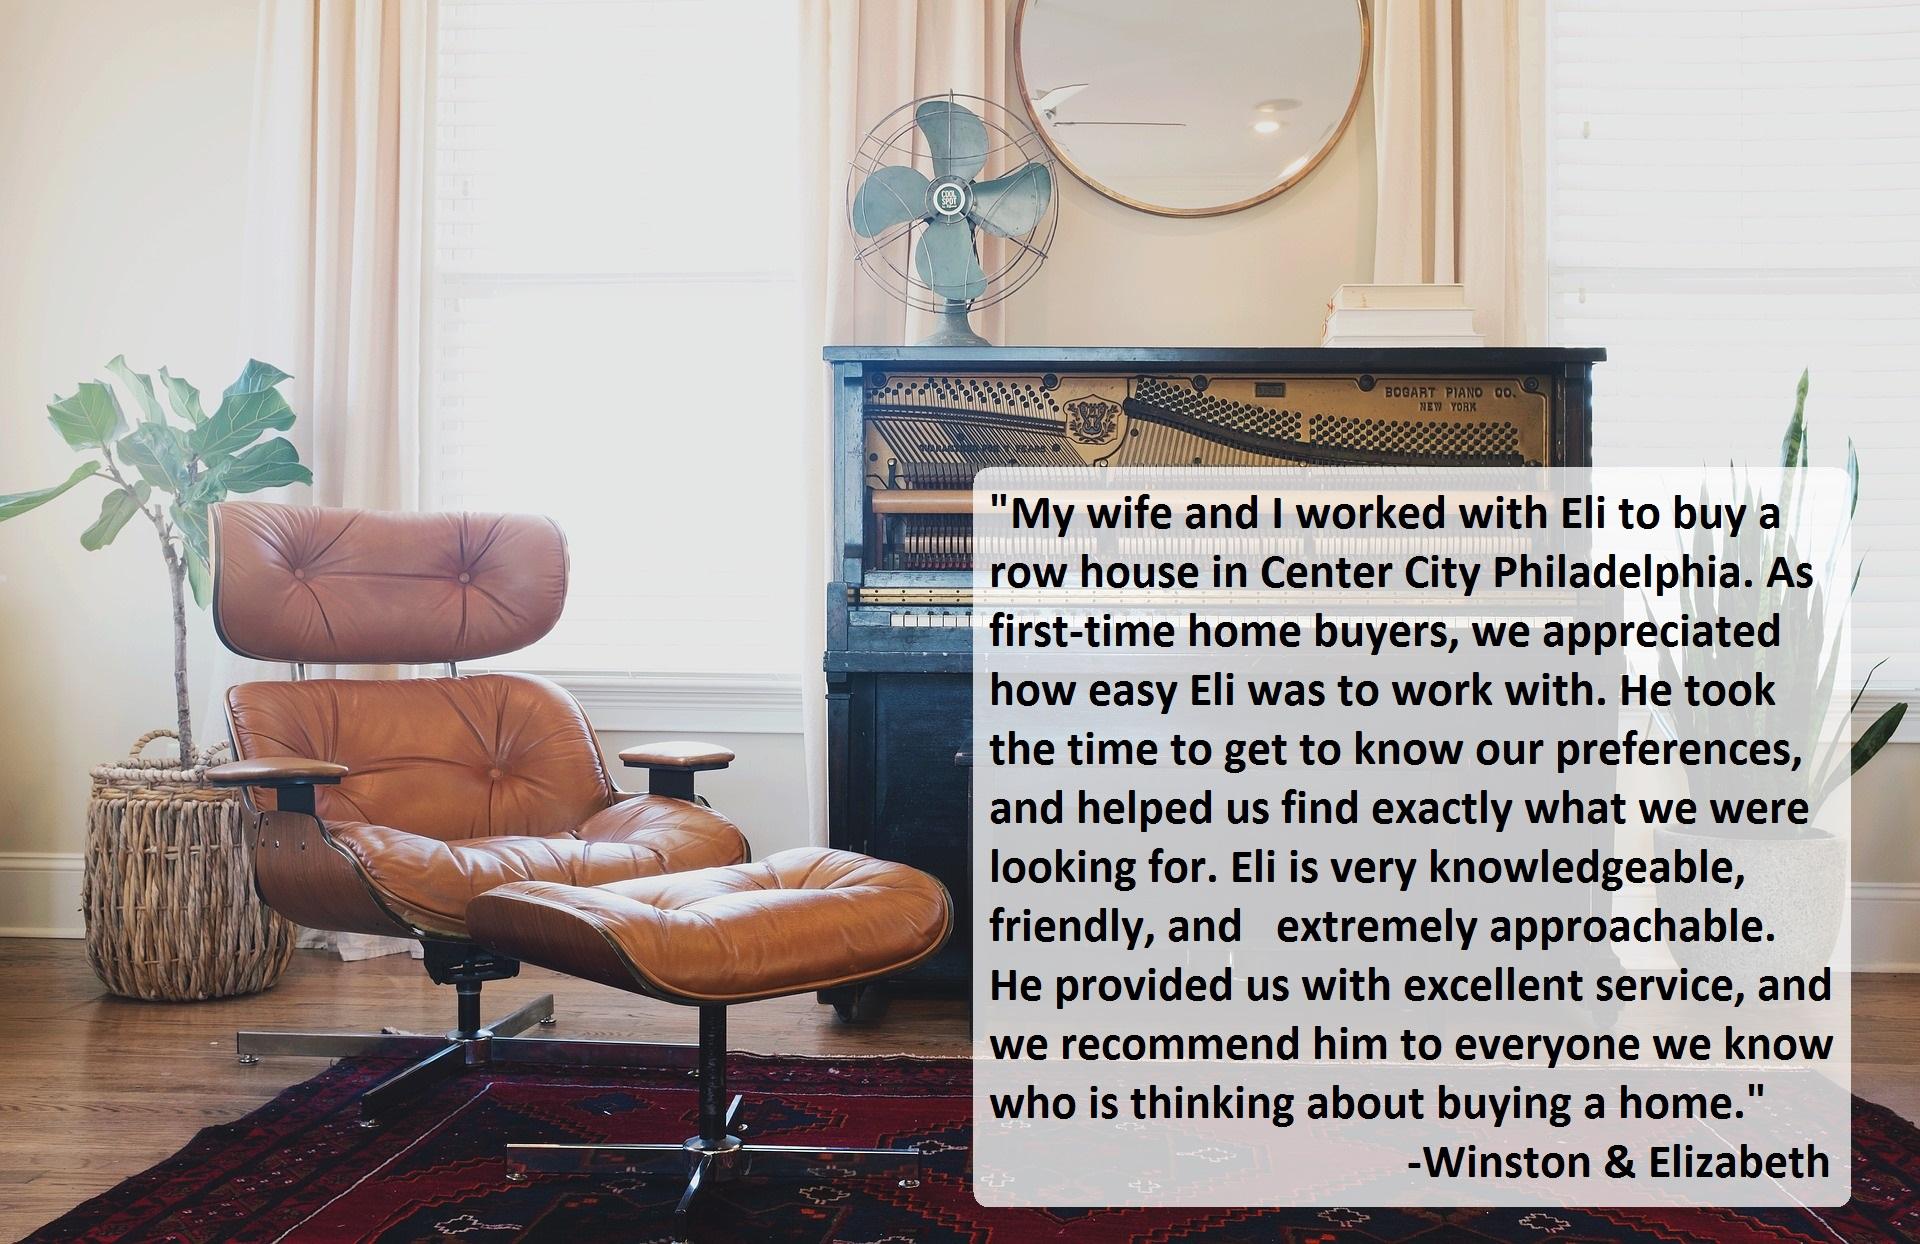 apartment-1835482_1920 text.jpg